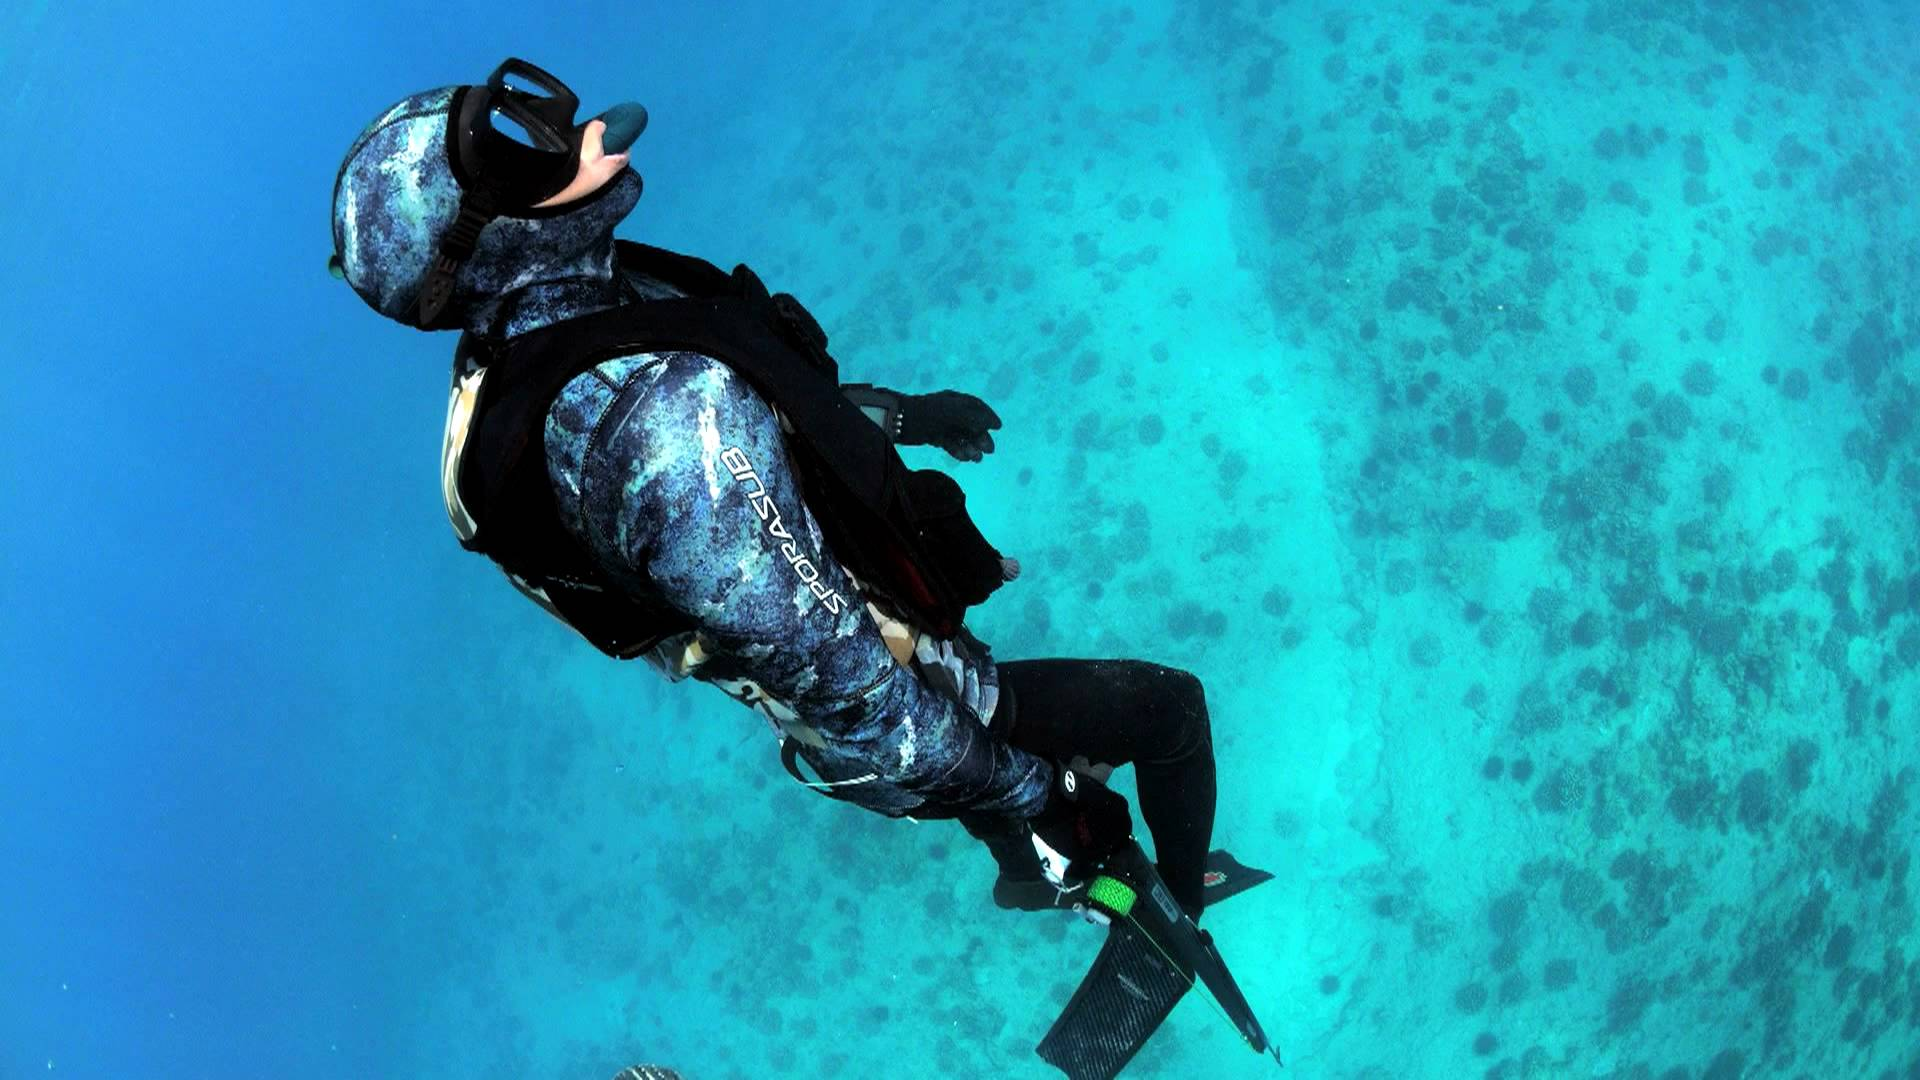 Freediving Video Freedivers Recovery Vest   FRV   Shark Freediving 1920x1080